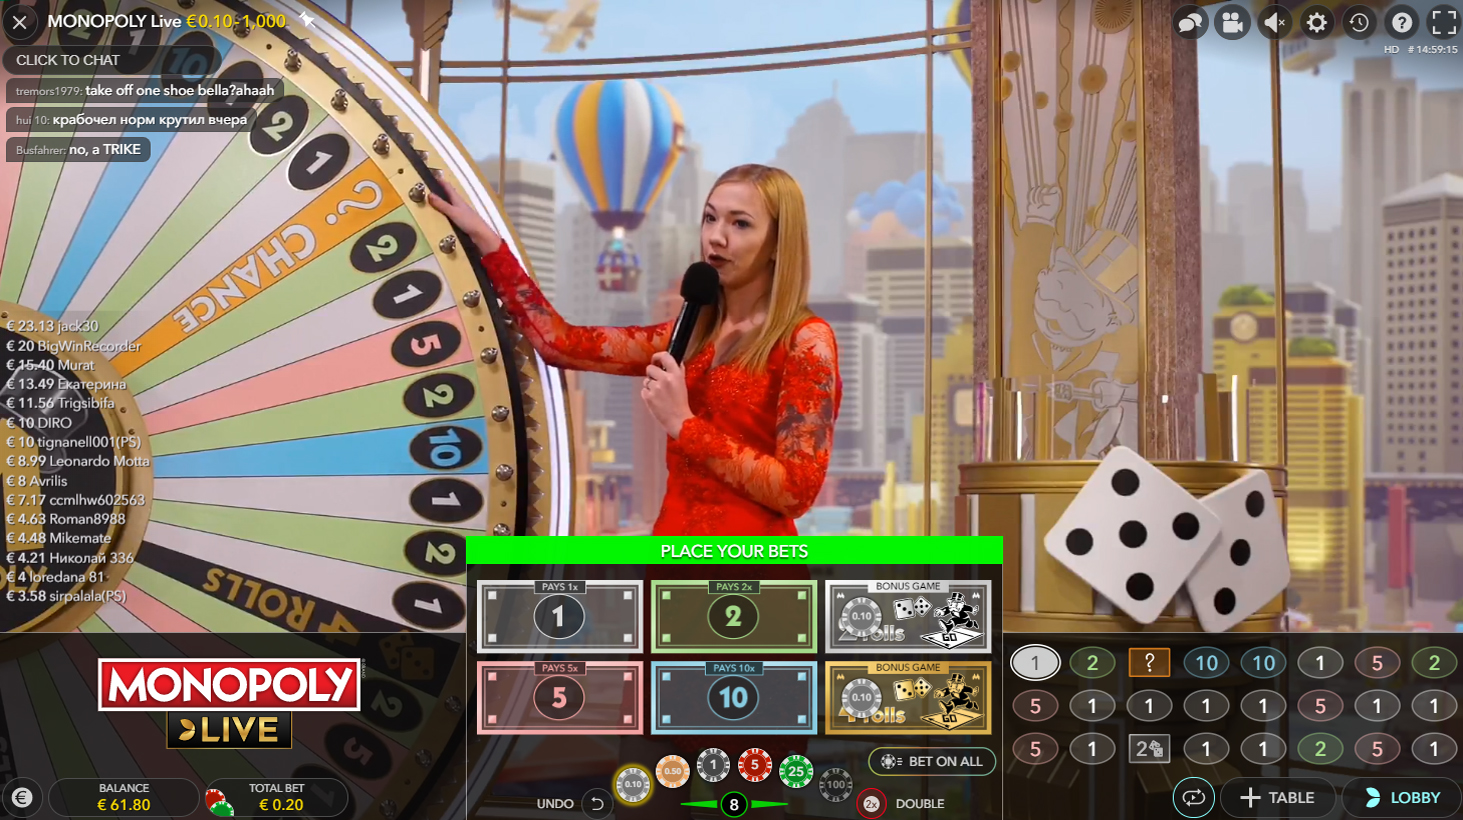 monopoly live evolution